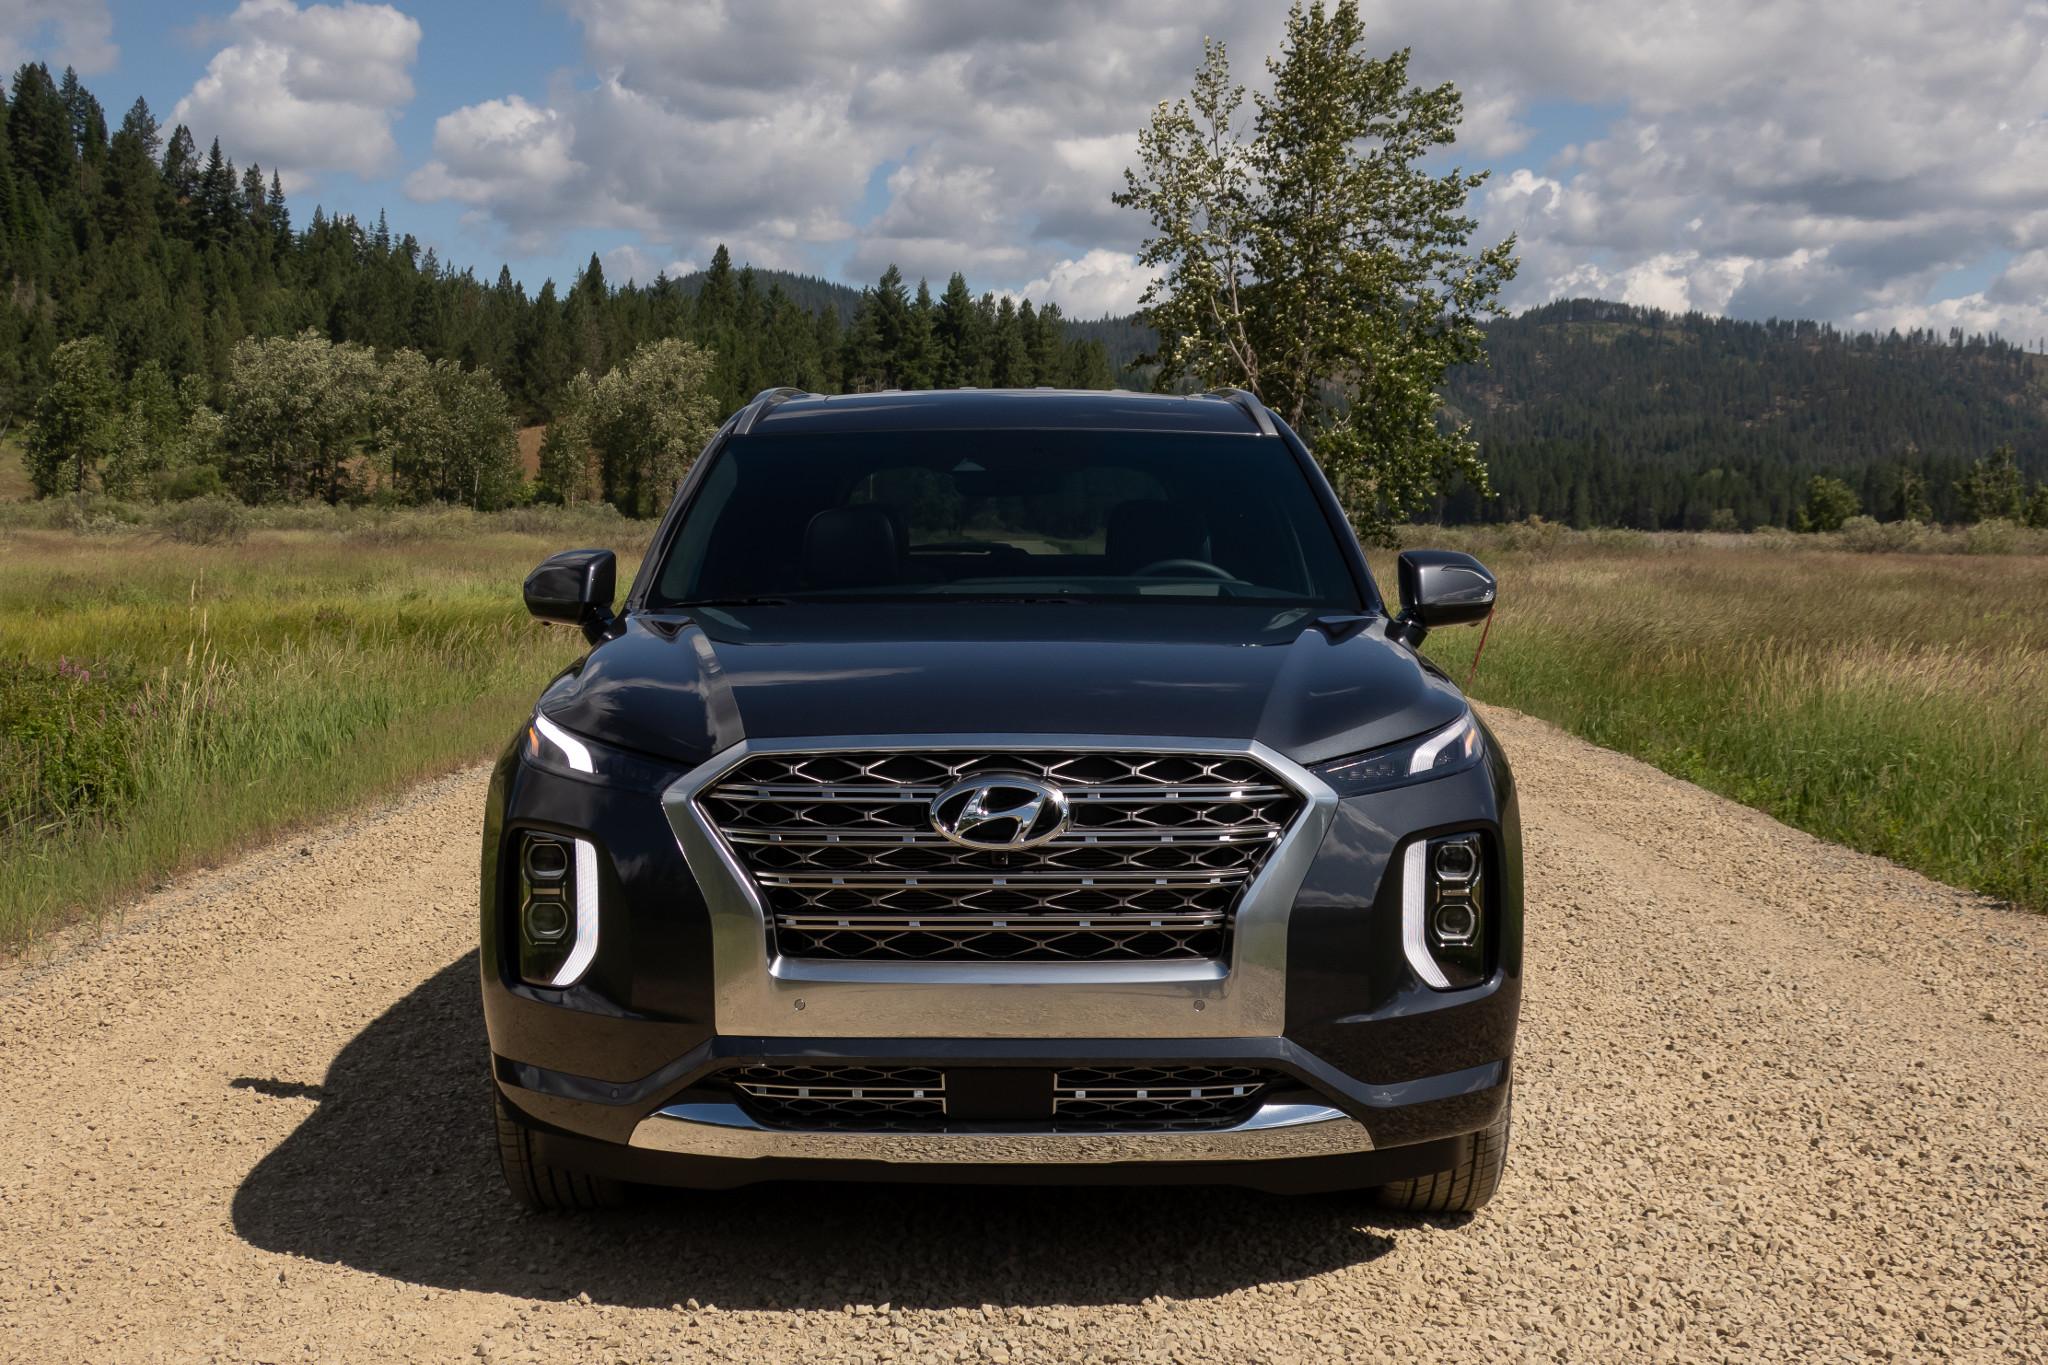 2020 Hyundai Palisade: Design, Specs, Release >> Top 5 Reviews And Videos Of The Week 2020 Hyundai Palisade